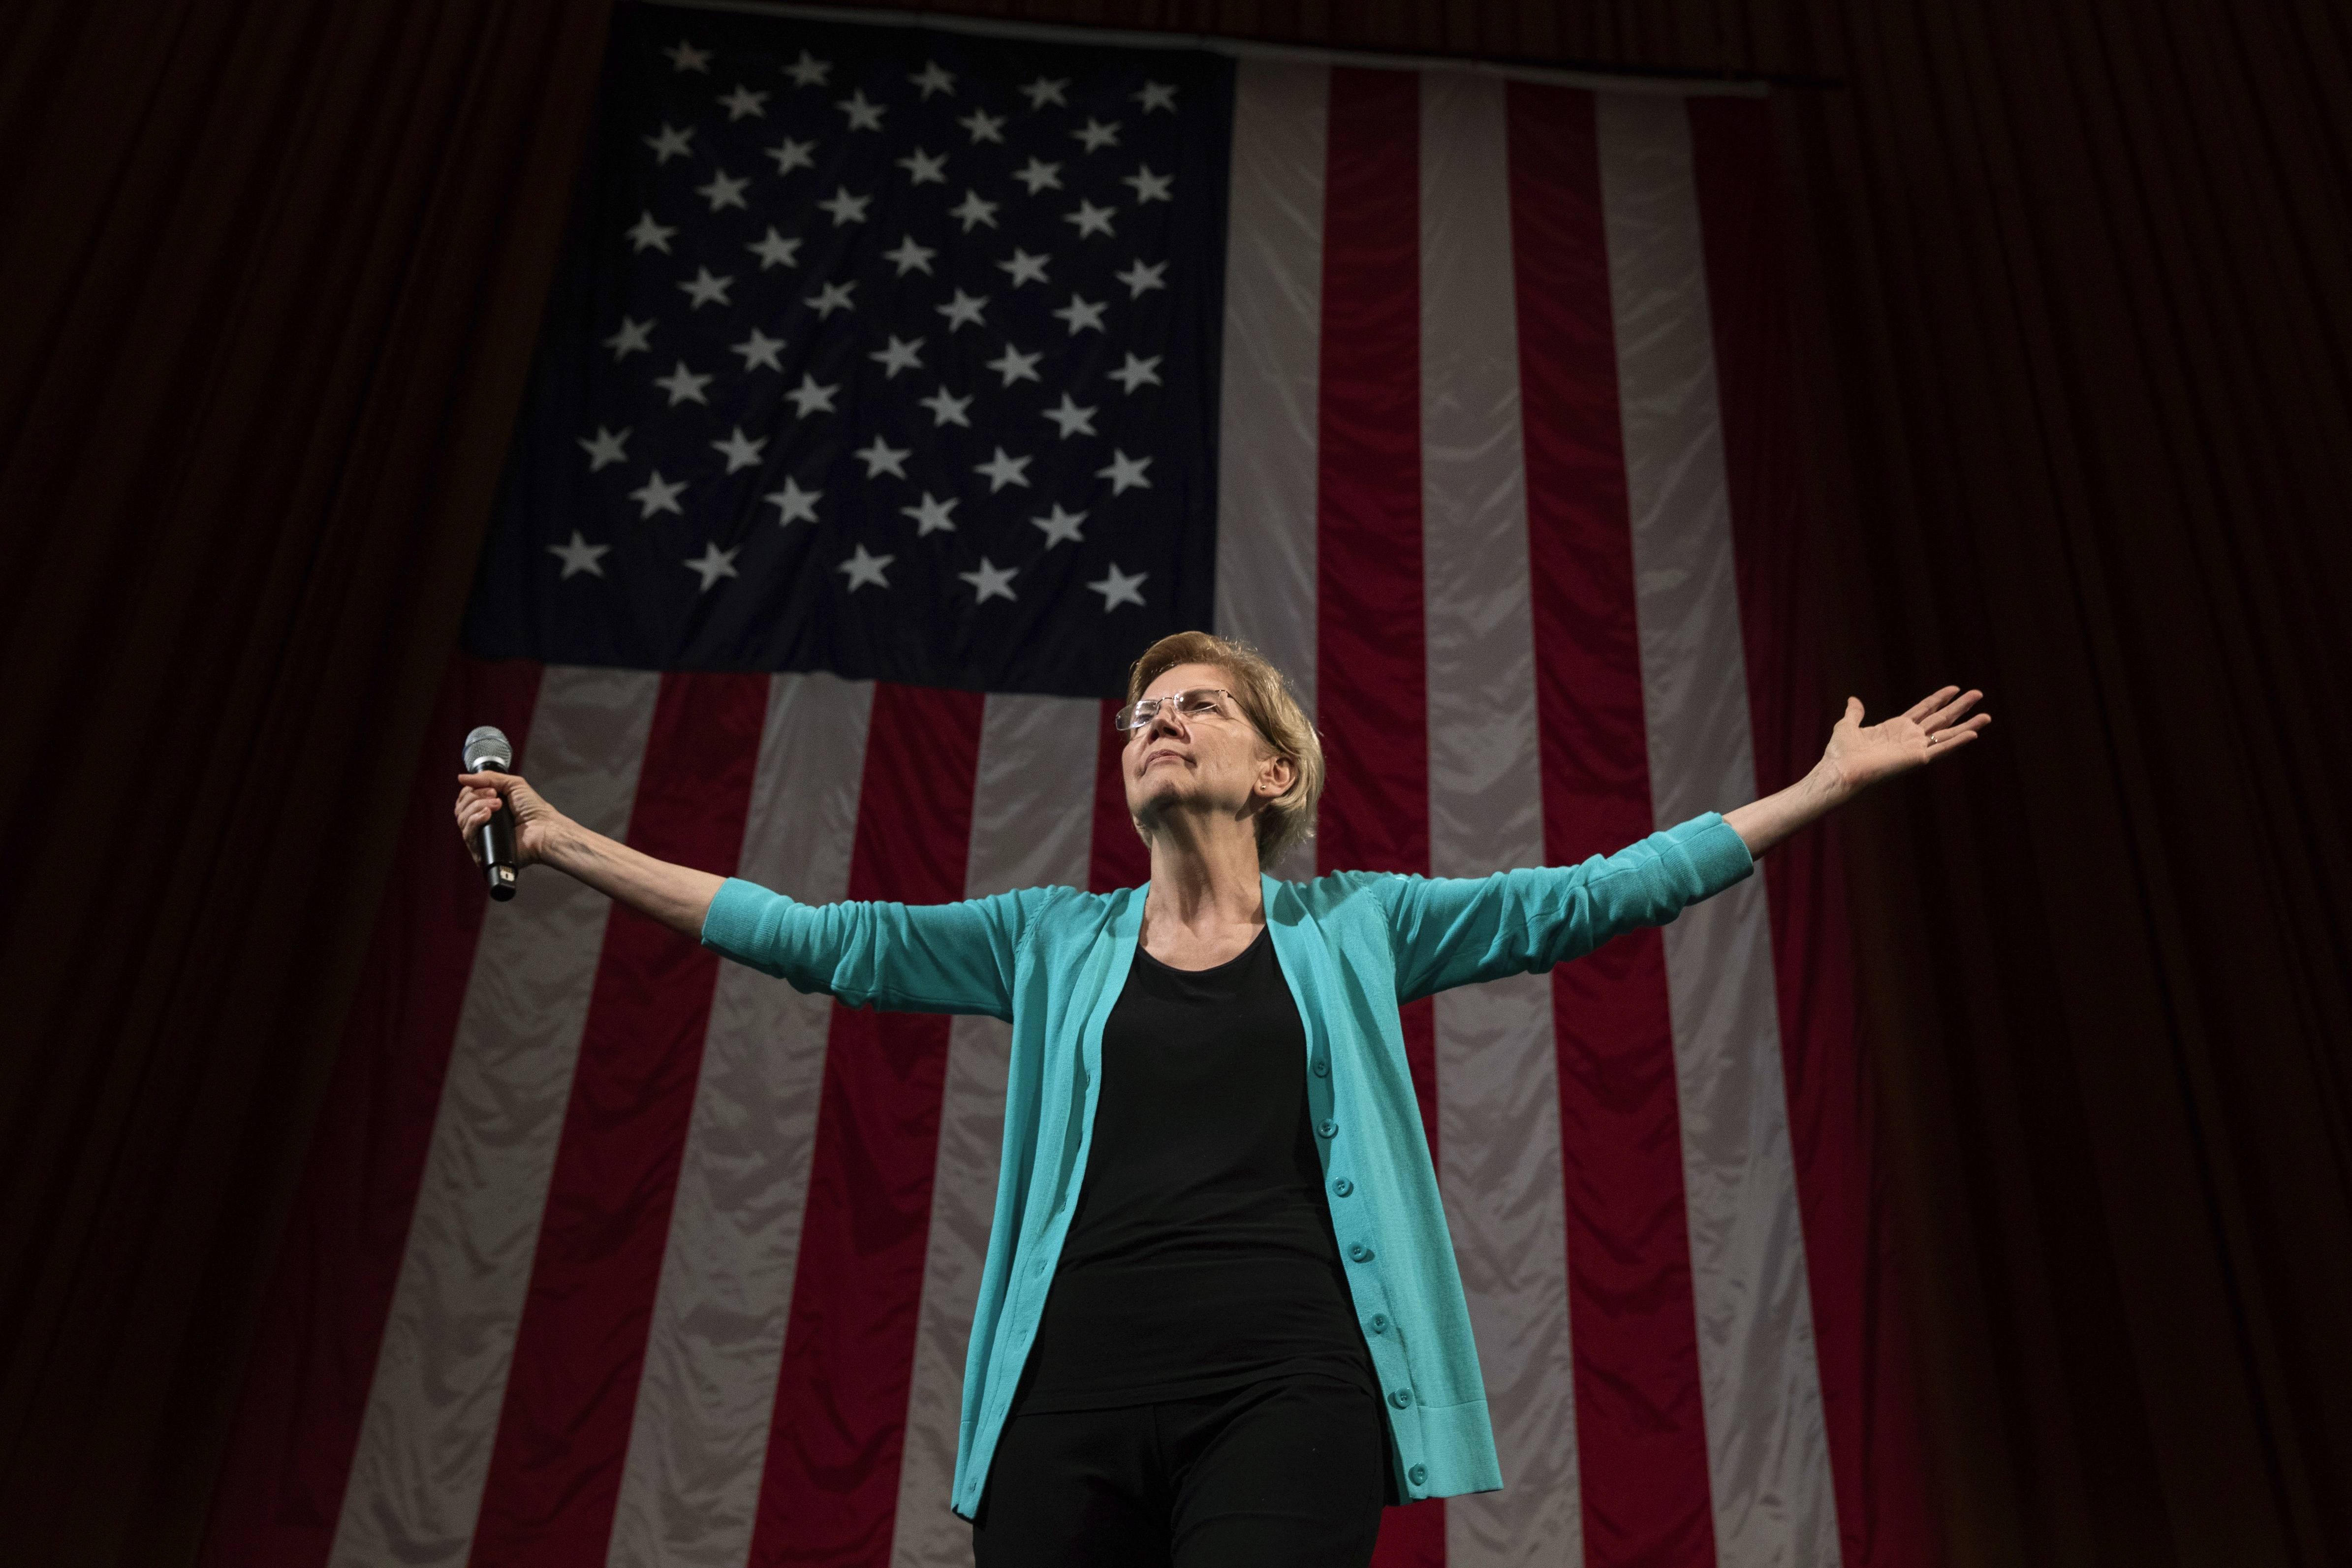 Warren raises $19.1M, topping Sanders in new fundraising